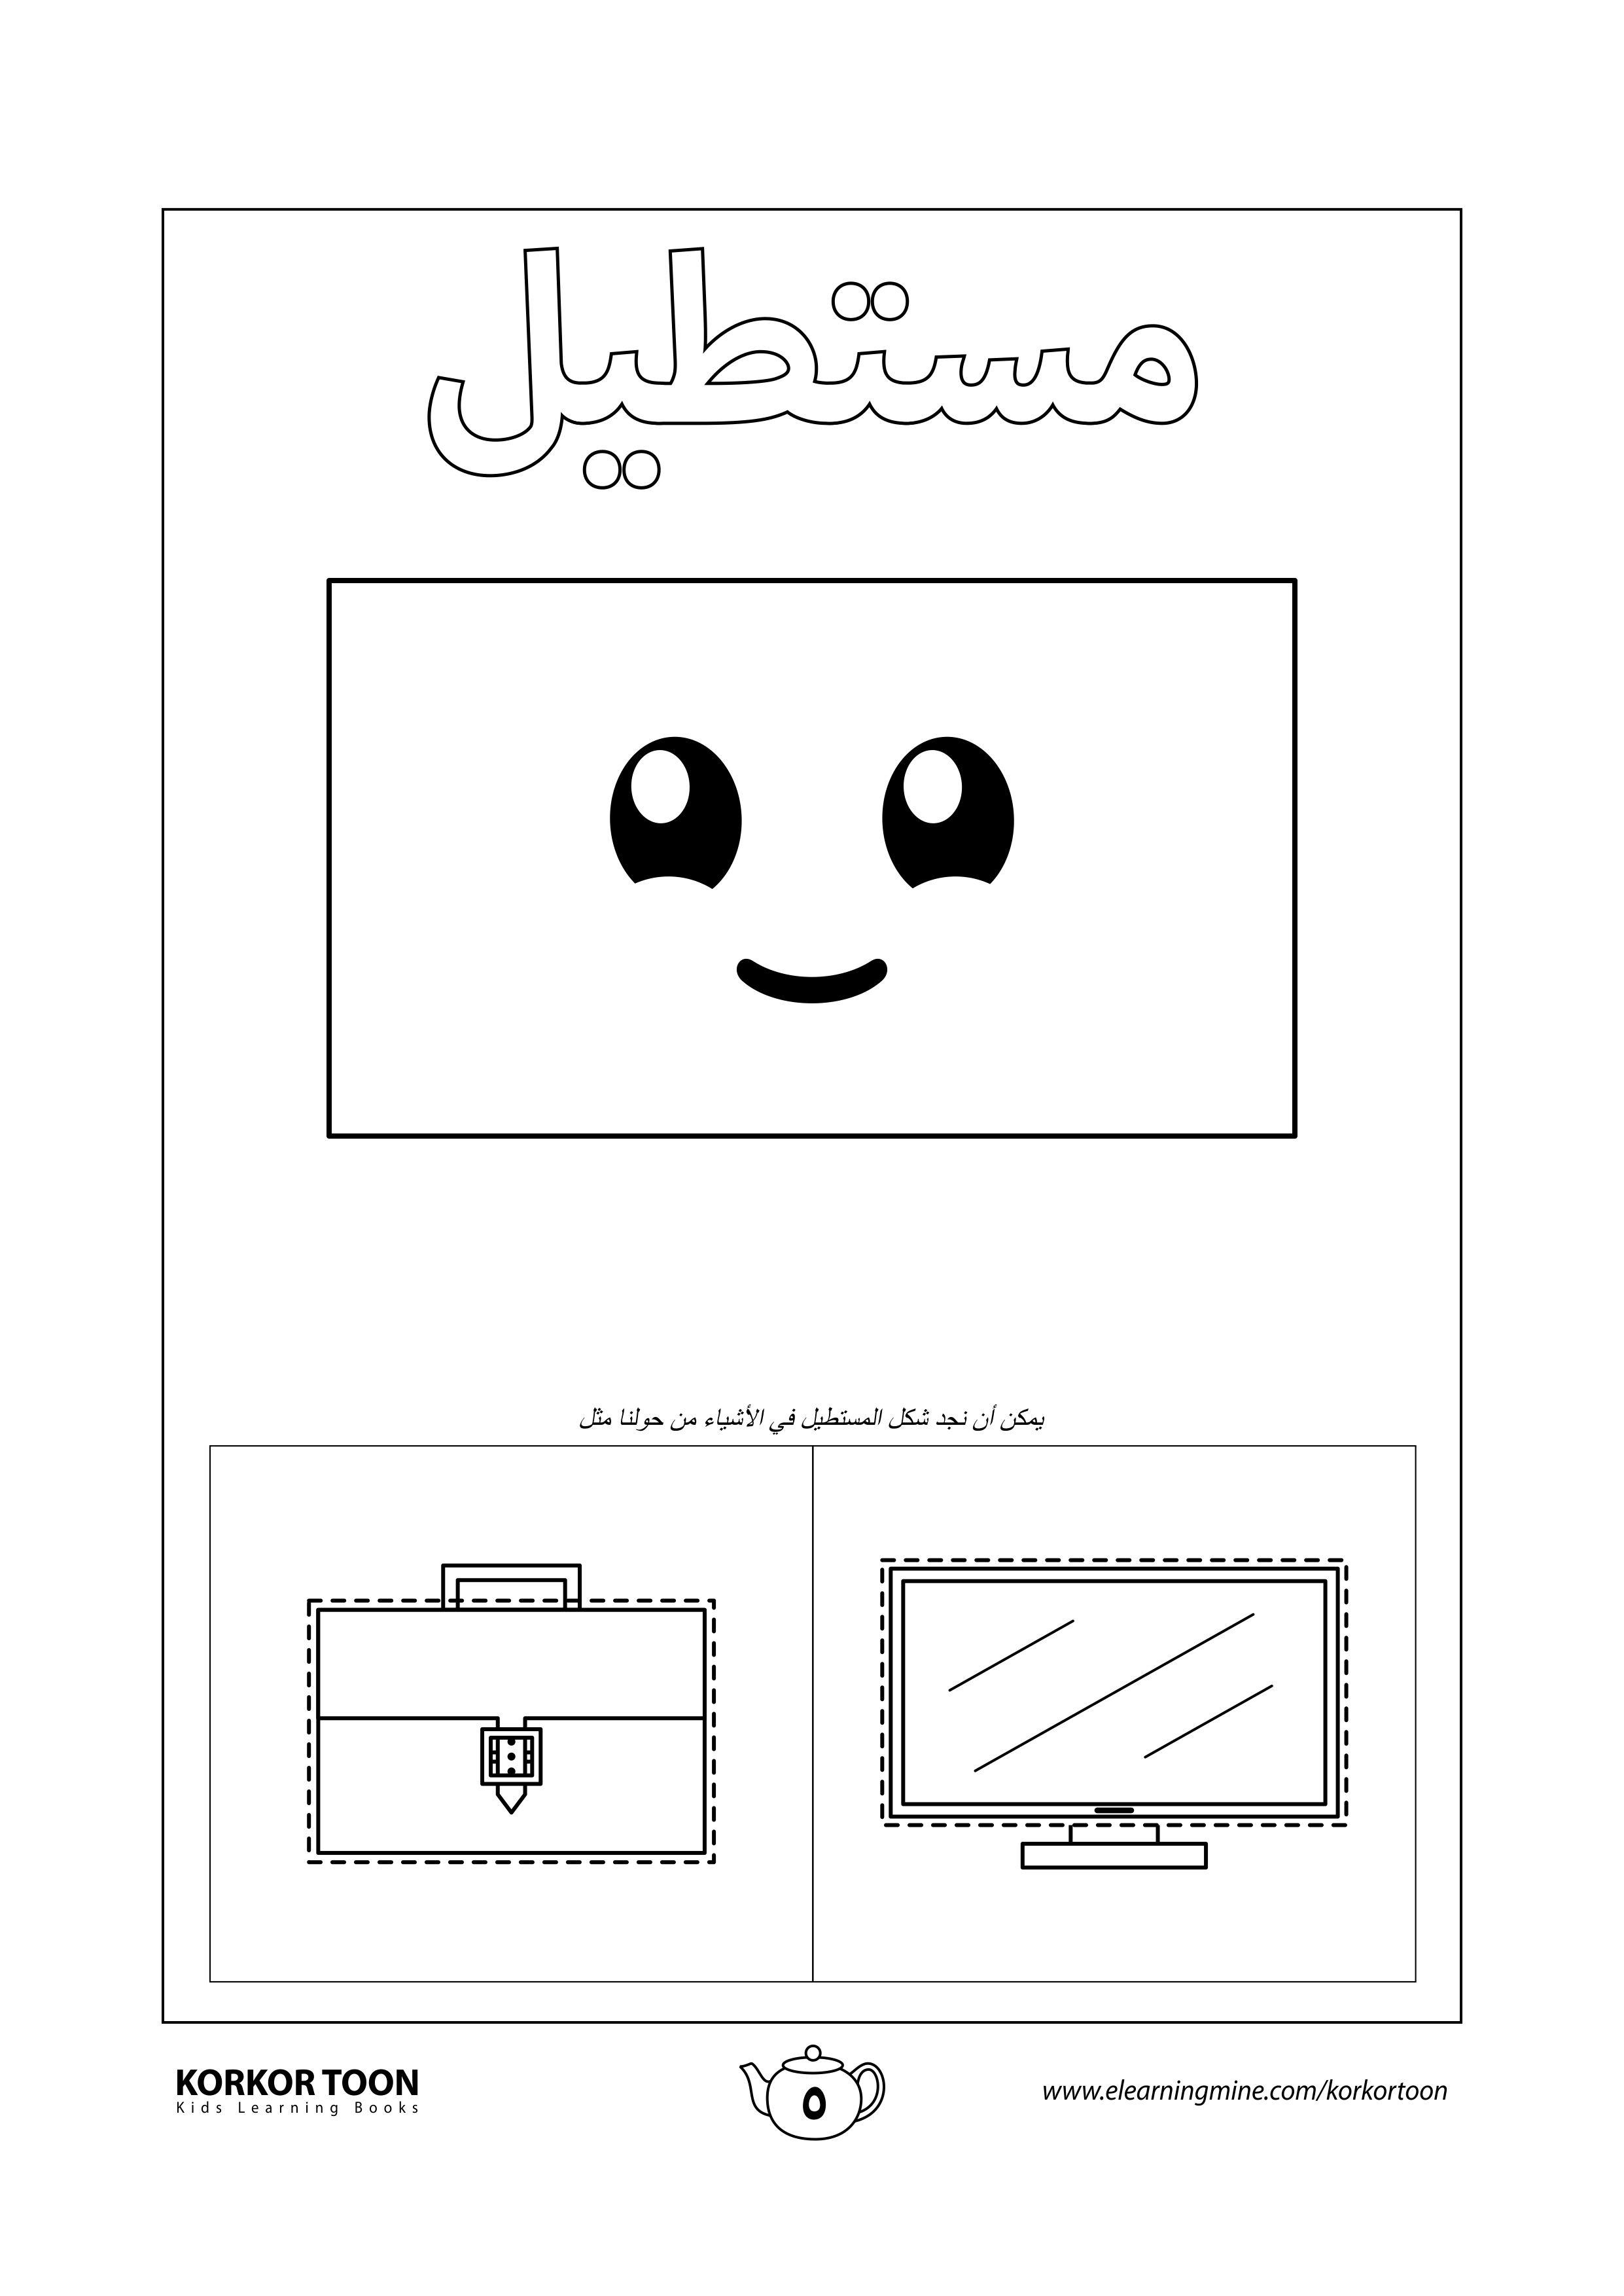 كتاب تلوين الأشكال الهندسية تلوين شكل المستطيل صفحة 5 Abc Coloring Pages Coloring Books Kids Coloring Books